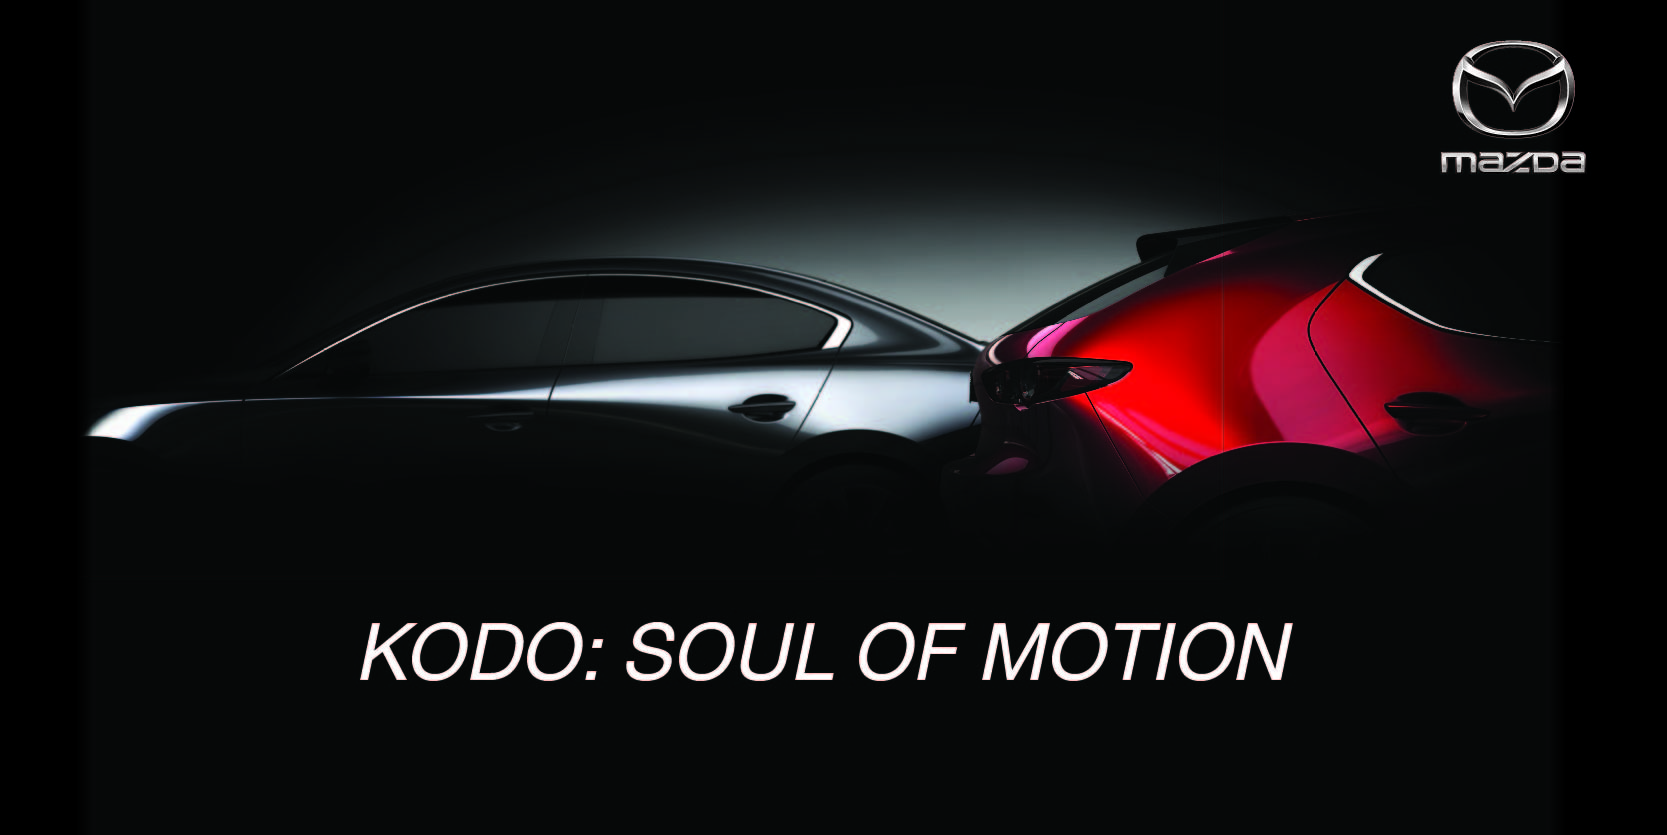 MAZDA การออกแบบโคโดะ (KODO DESIGN)